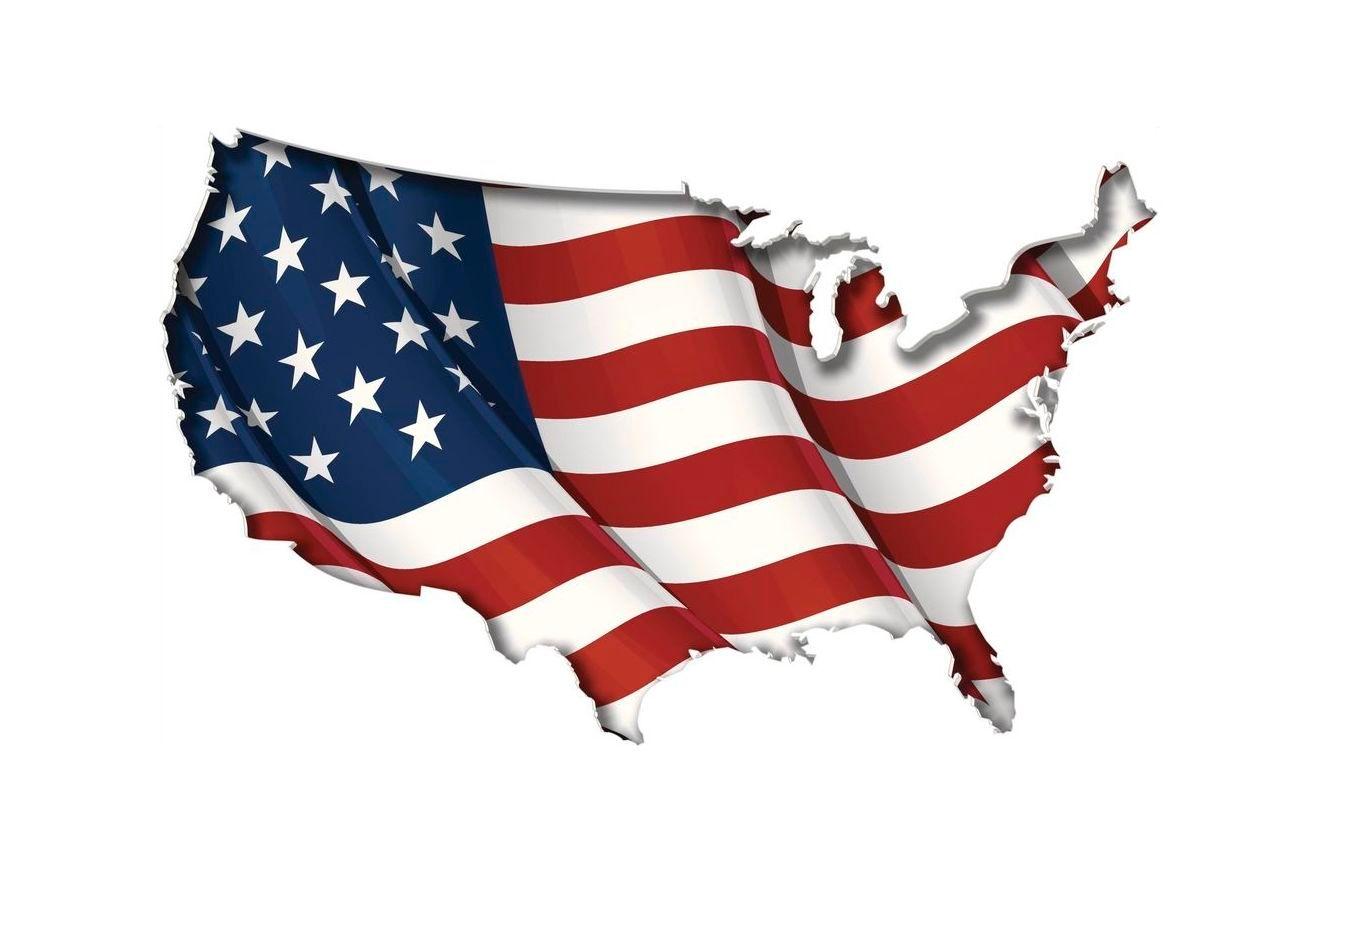 Test Slepa Mapa Usa Jak Ne Znate Spojene Staty Americke